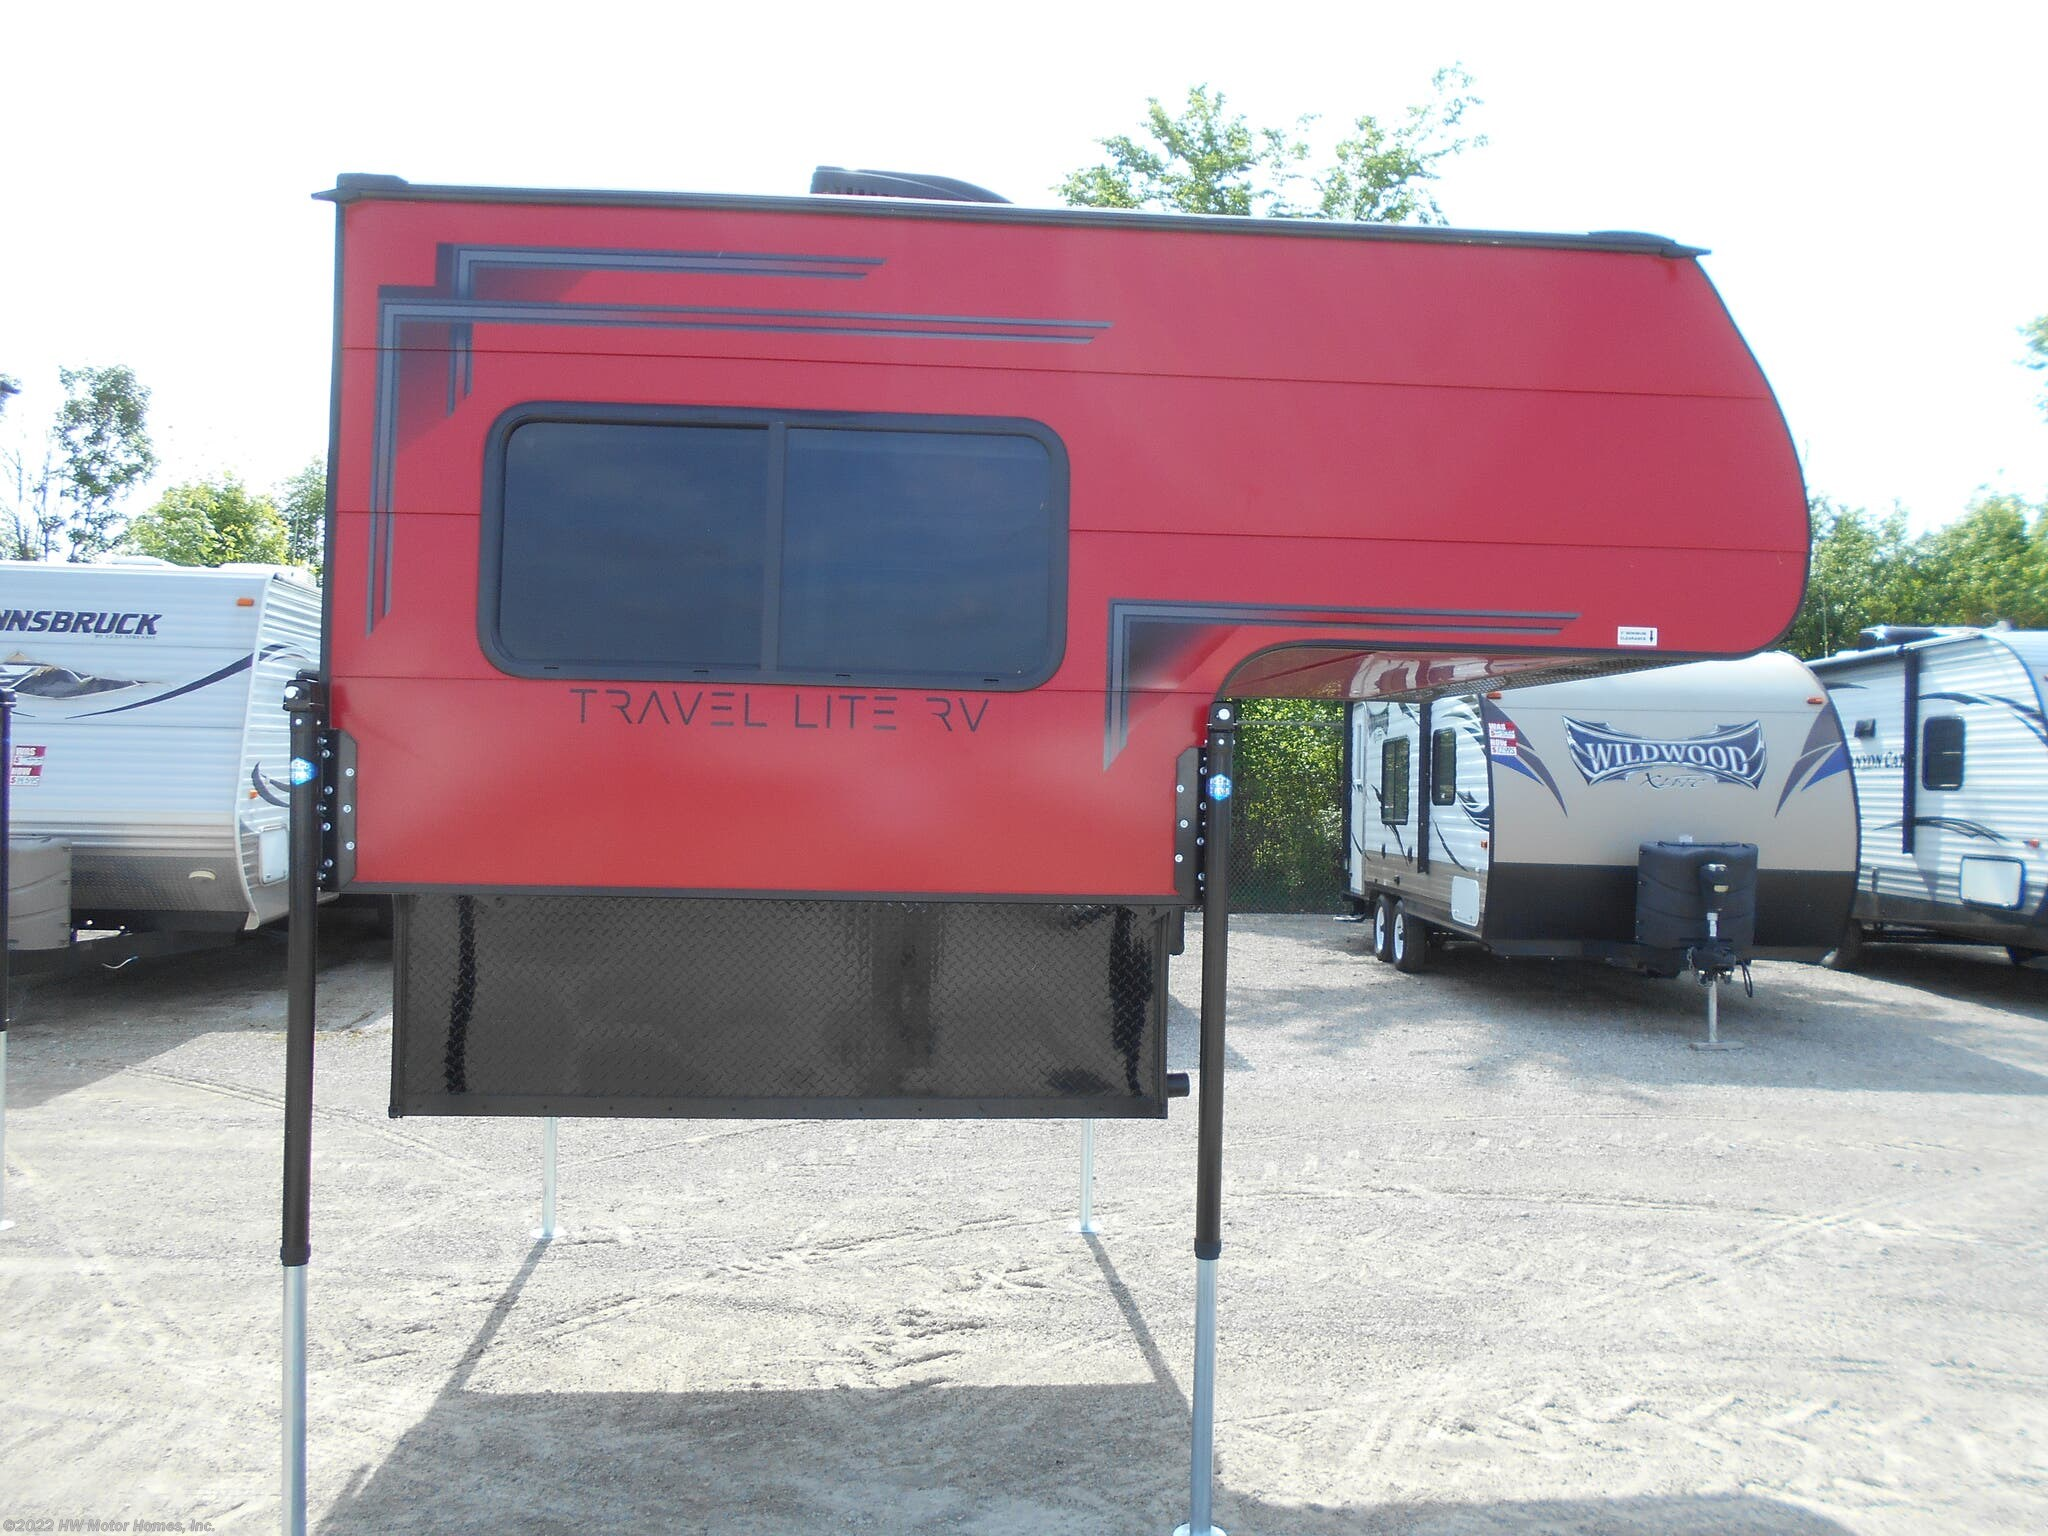 #N06264 - 2020 Travel Lite Super Lite 625 - 040 RED for sale in Canton MI